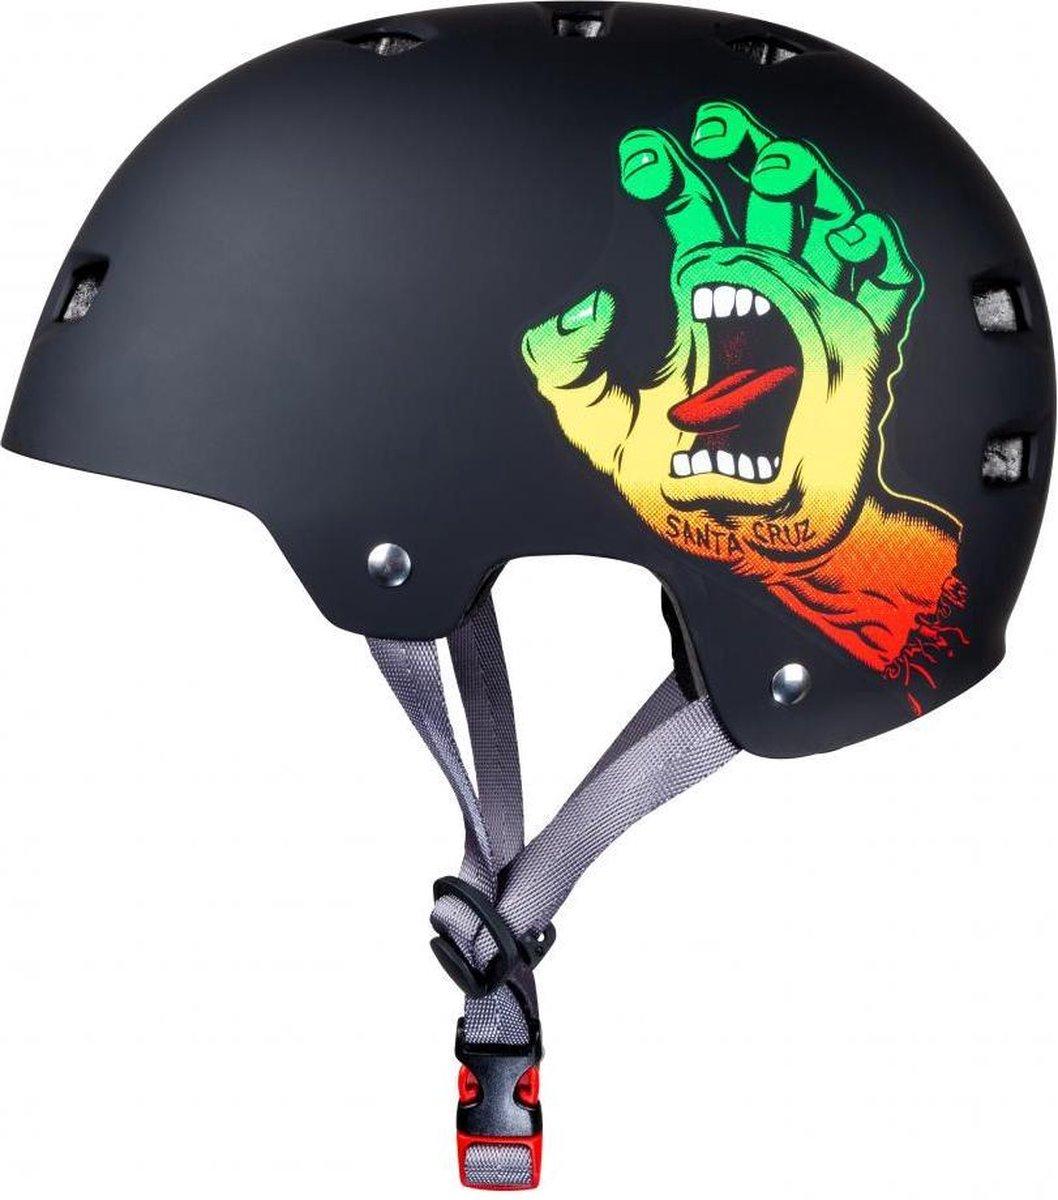 Bullet x Santa Cruz Screaming Hand skateboard helm rasta